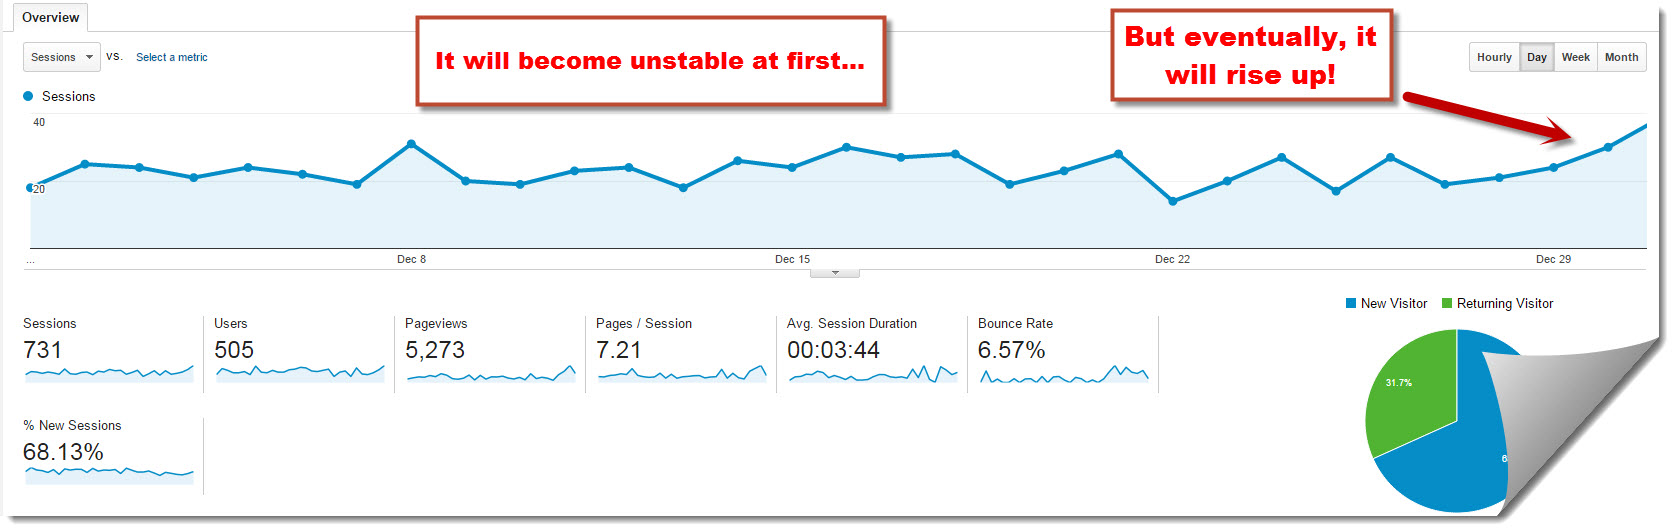 My Internet Quest's Google Analytics for December 2014